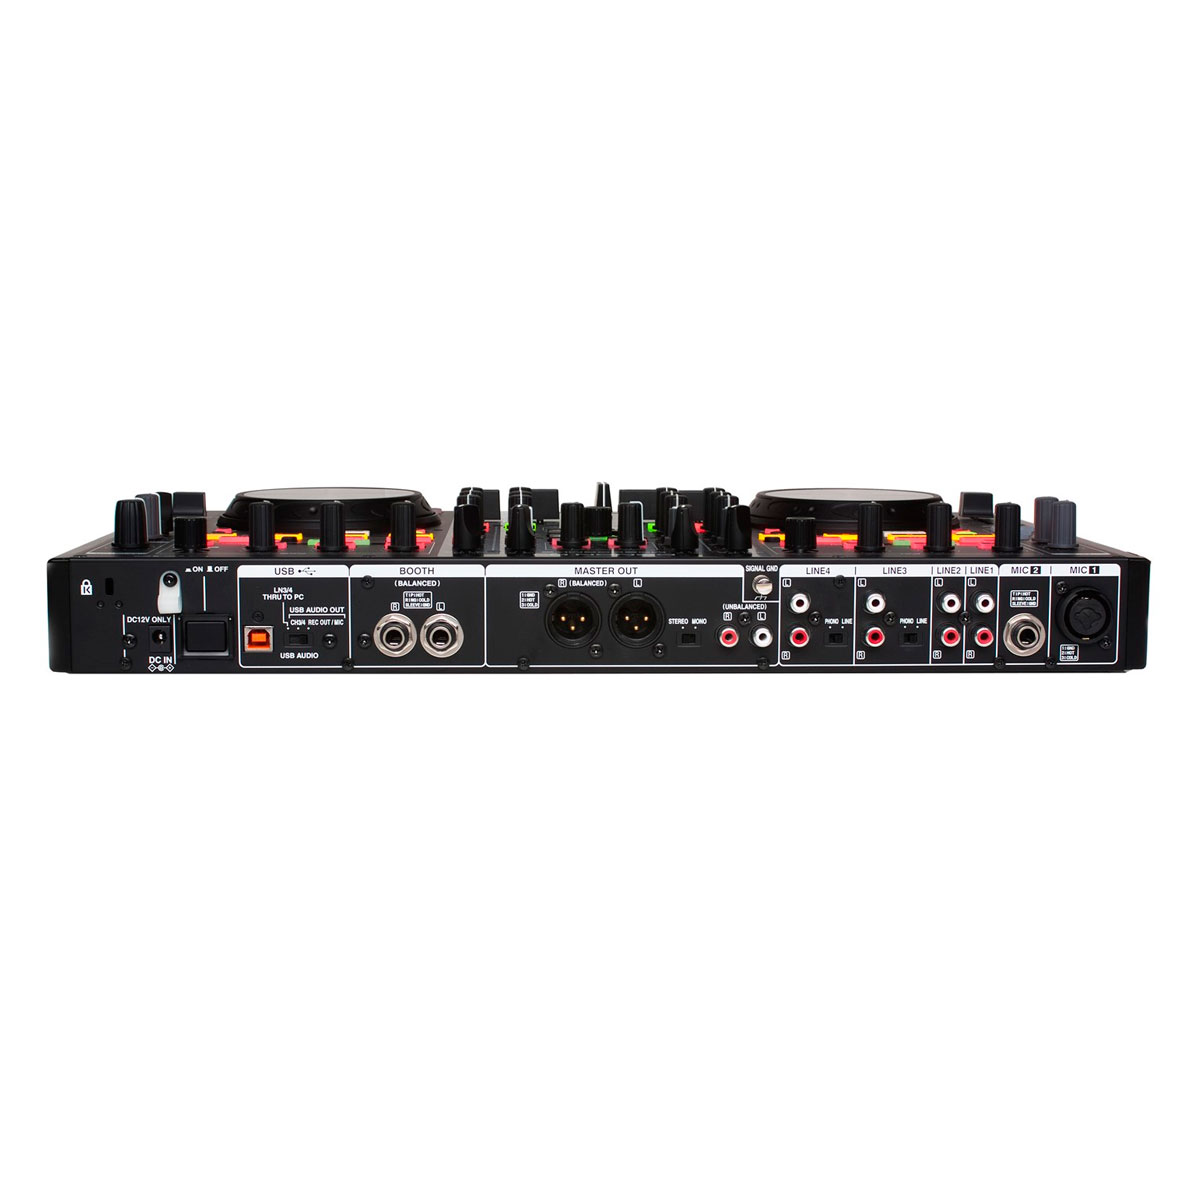 MC6000MK2 - Controladora DJ c/ USB MC 6000 MK2 - Denon DJ